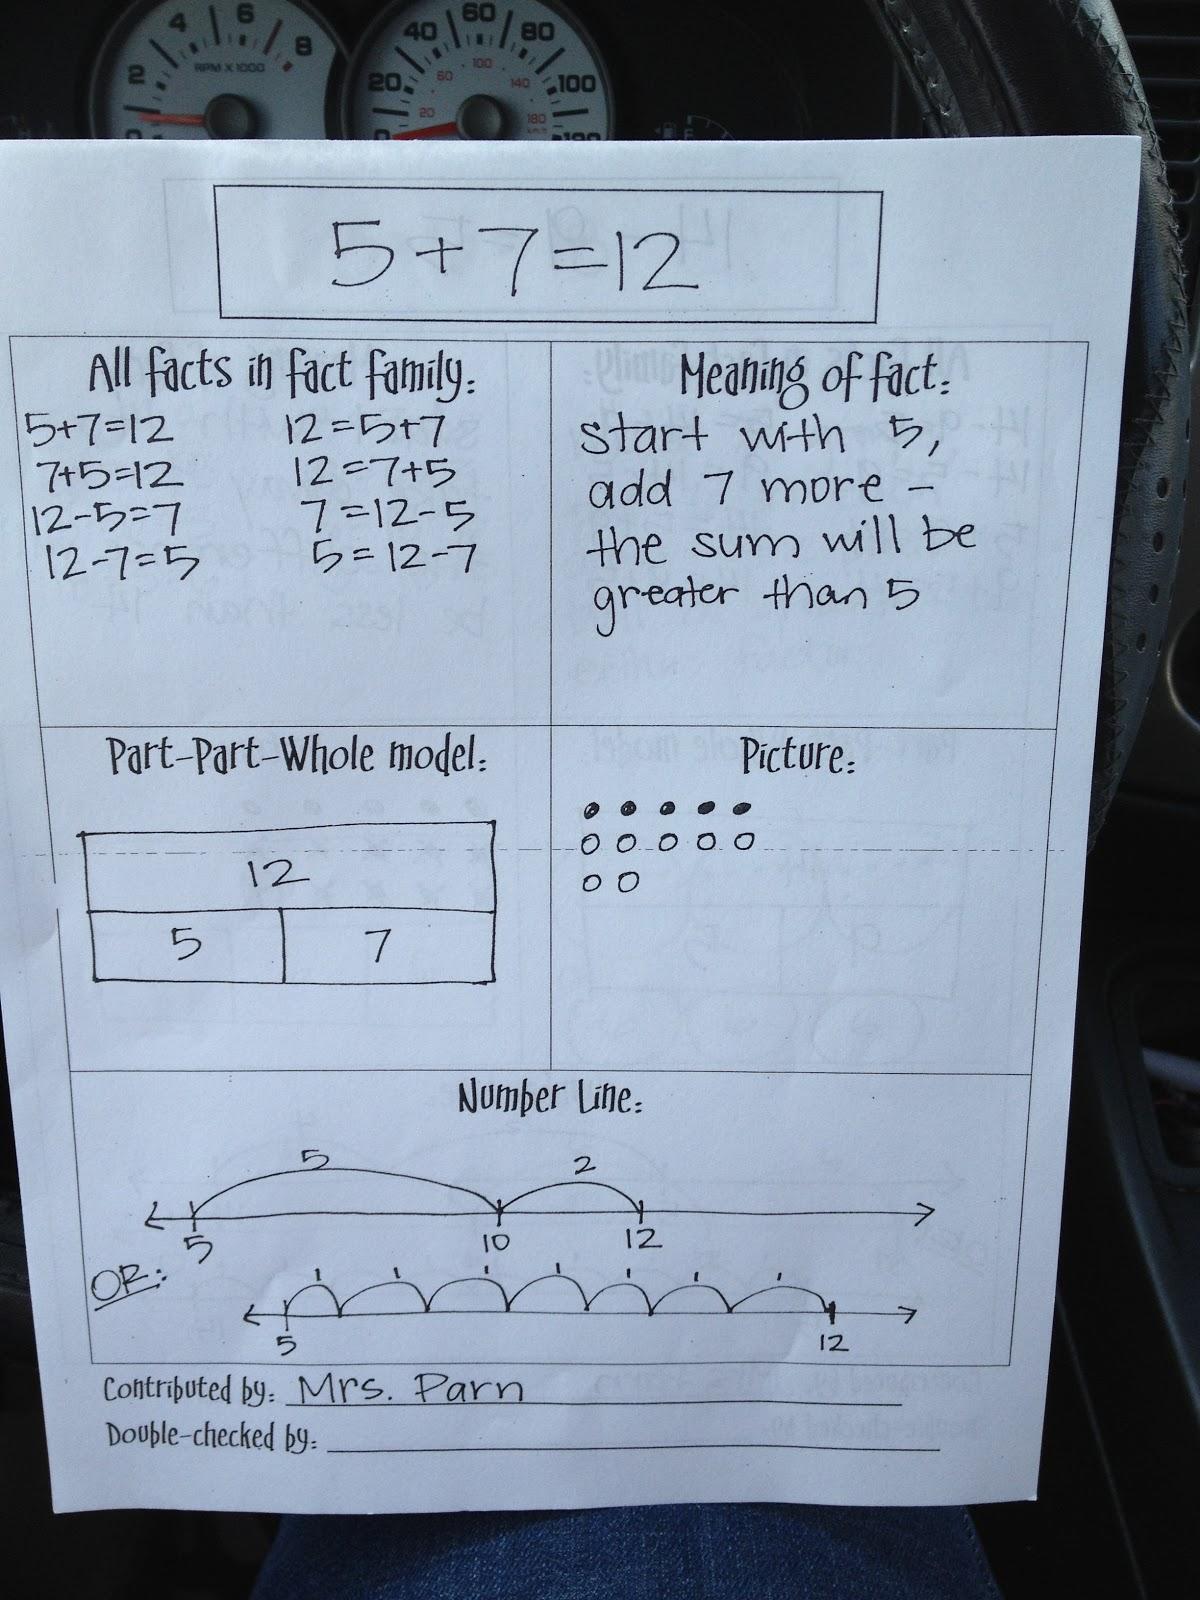 3 Teacher Chicks Amazing Math Facts Idea I Learned